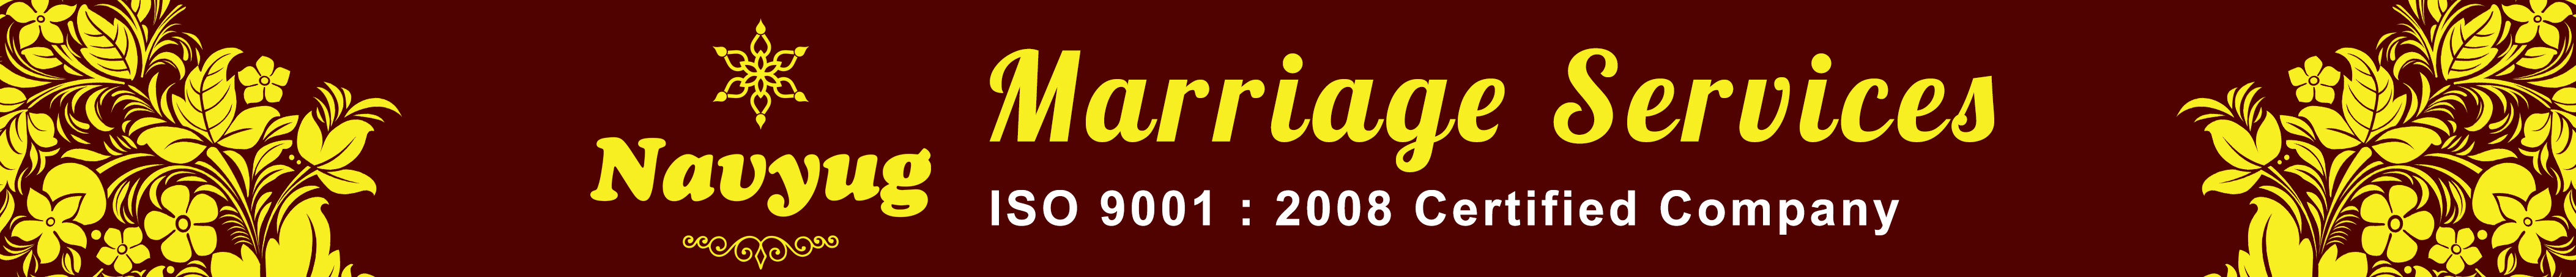 Govt marriage registration certficate pune pimpri chinchwad marriage registration certificate in pune pimpri chinchwad yelopaper Image collections